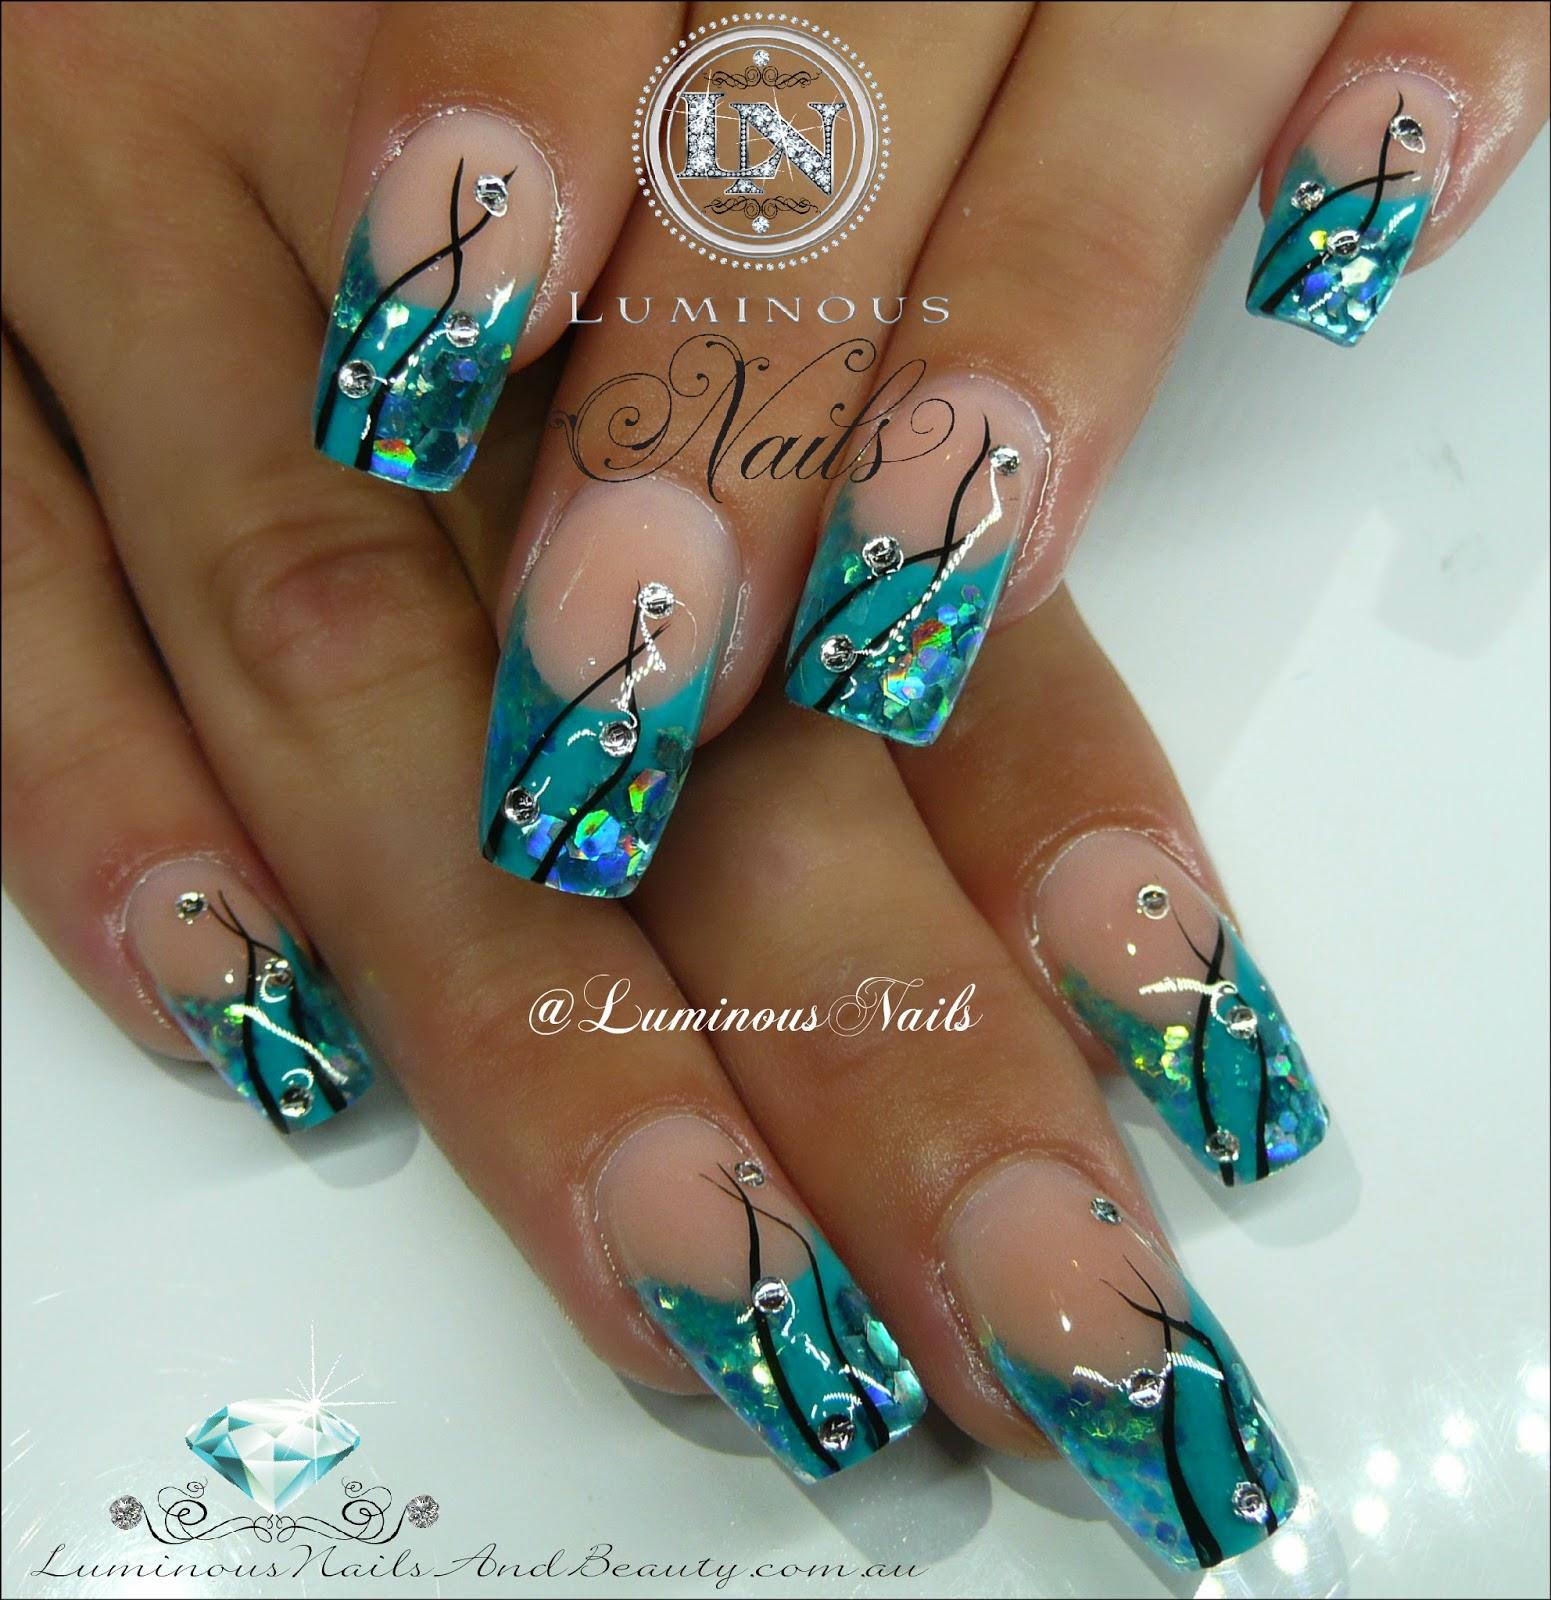 Luminous nails, Nude nails and Nails on Pinterest